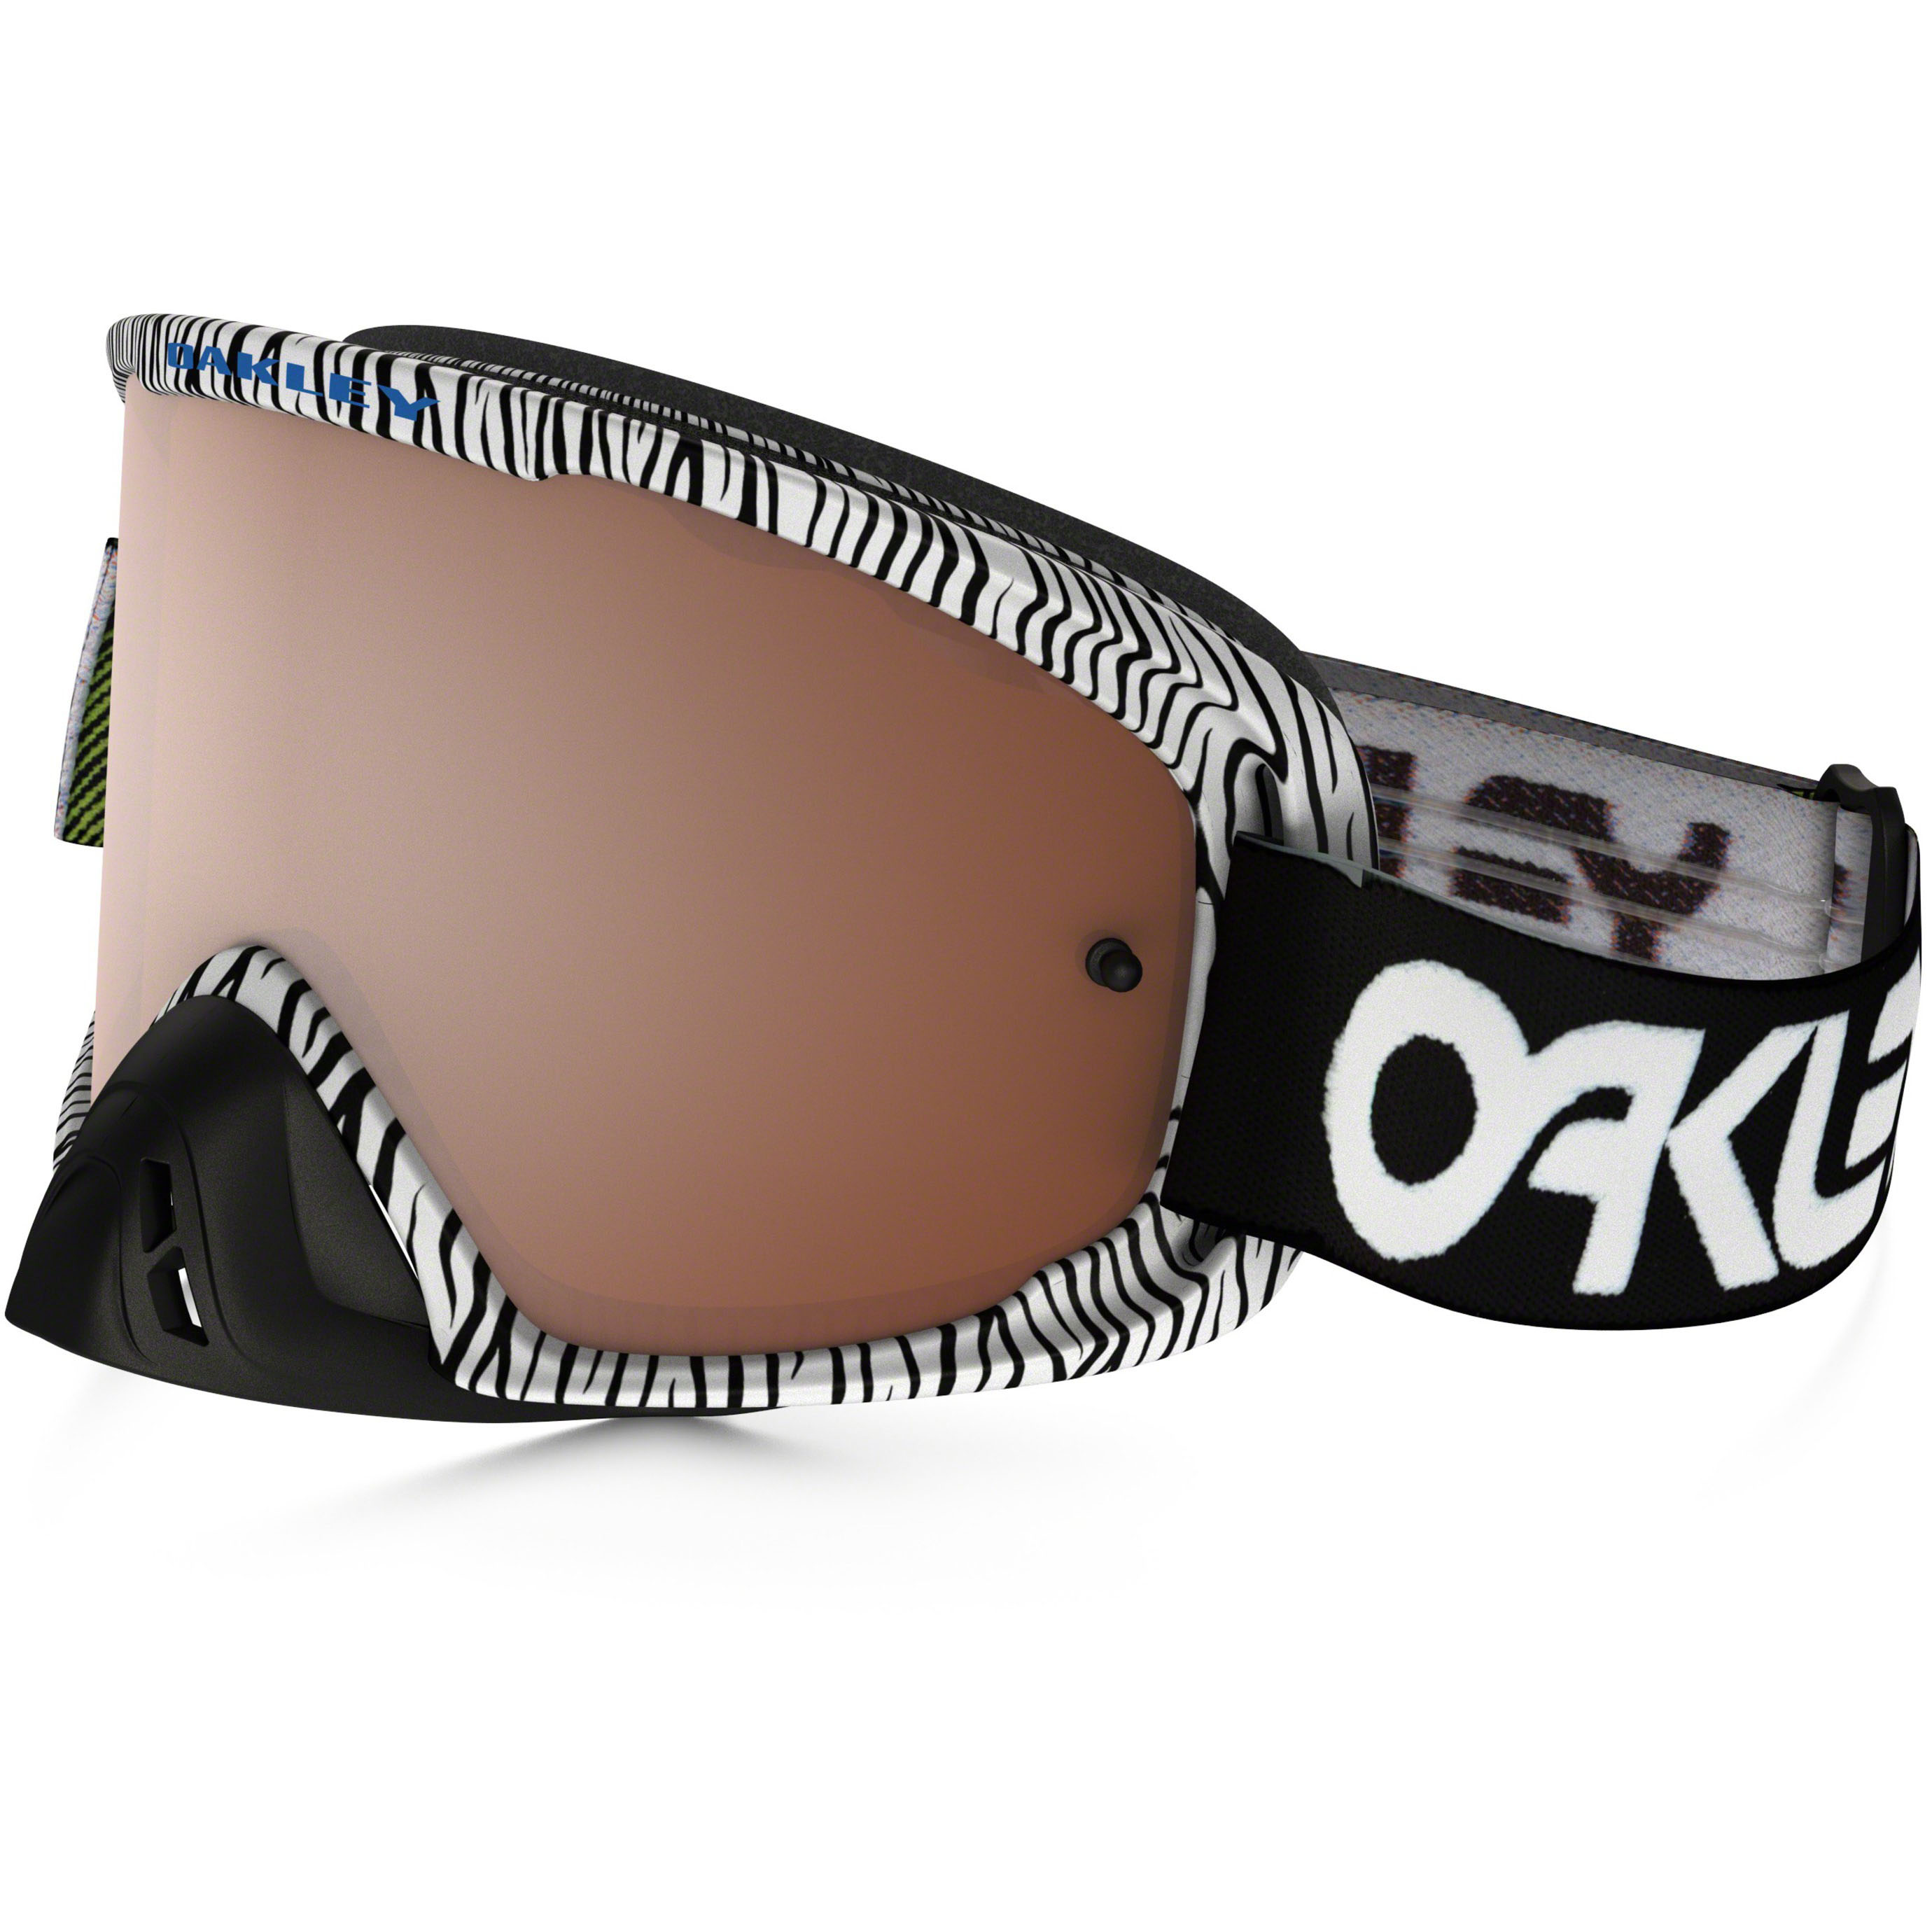 b17b971c9e8 Oakley Goggles O2 MX Factory Black White Bengal Black Iridium   Clear Lens